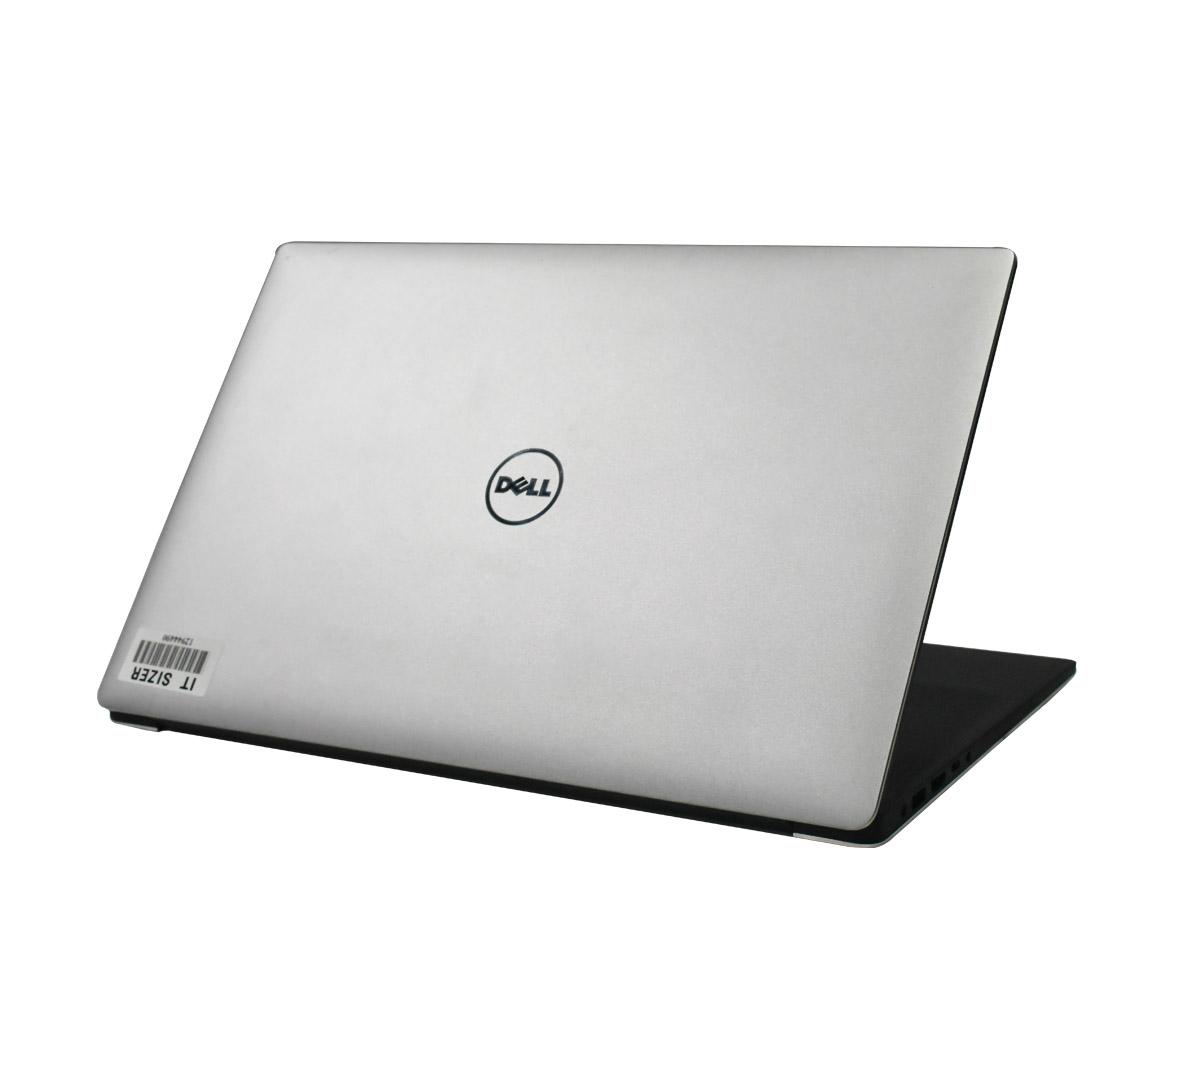 Dell Precision 5520 Business Laptop, Intel Core i7-7820HQ CPU, 8GB DDR4 SODIMM RAM, 256GB SSD M2, 15 inch Touch Display, Windows 10 pro (Refurbished)